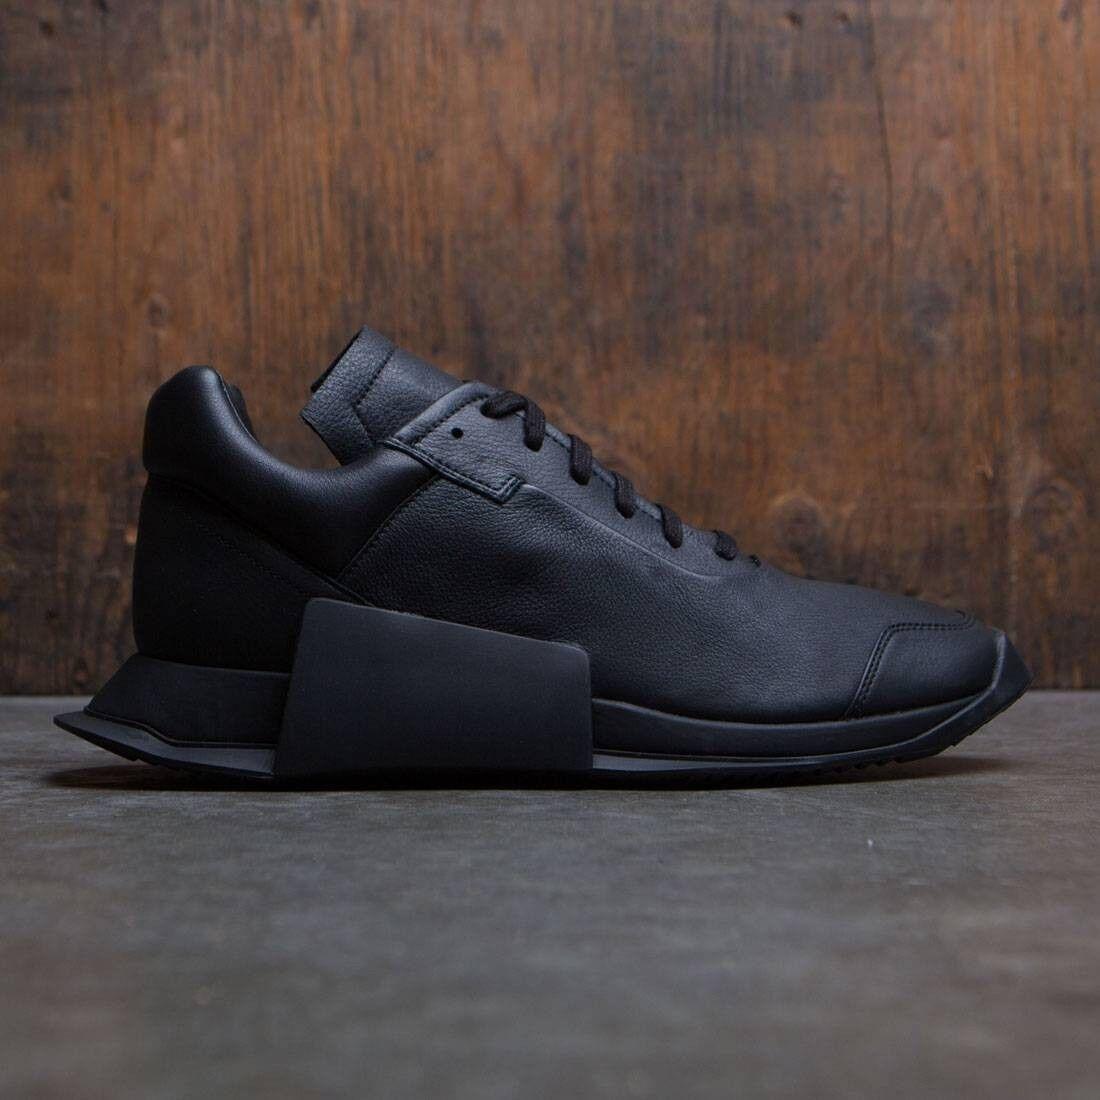 780 Authentic ADIDAS X RICK OWENS Men's Ro Level Runner II Sneakers Trainer